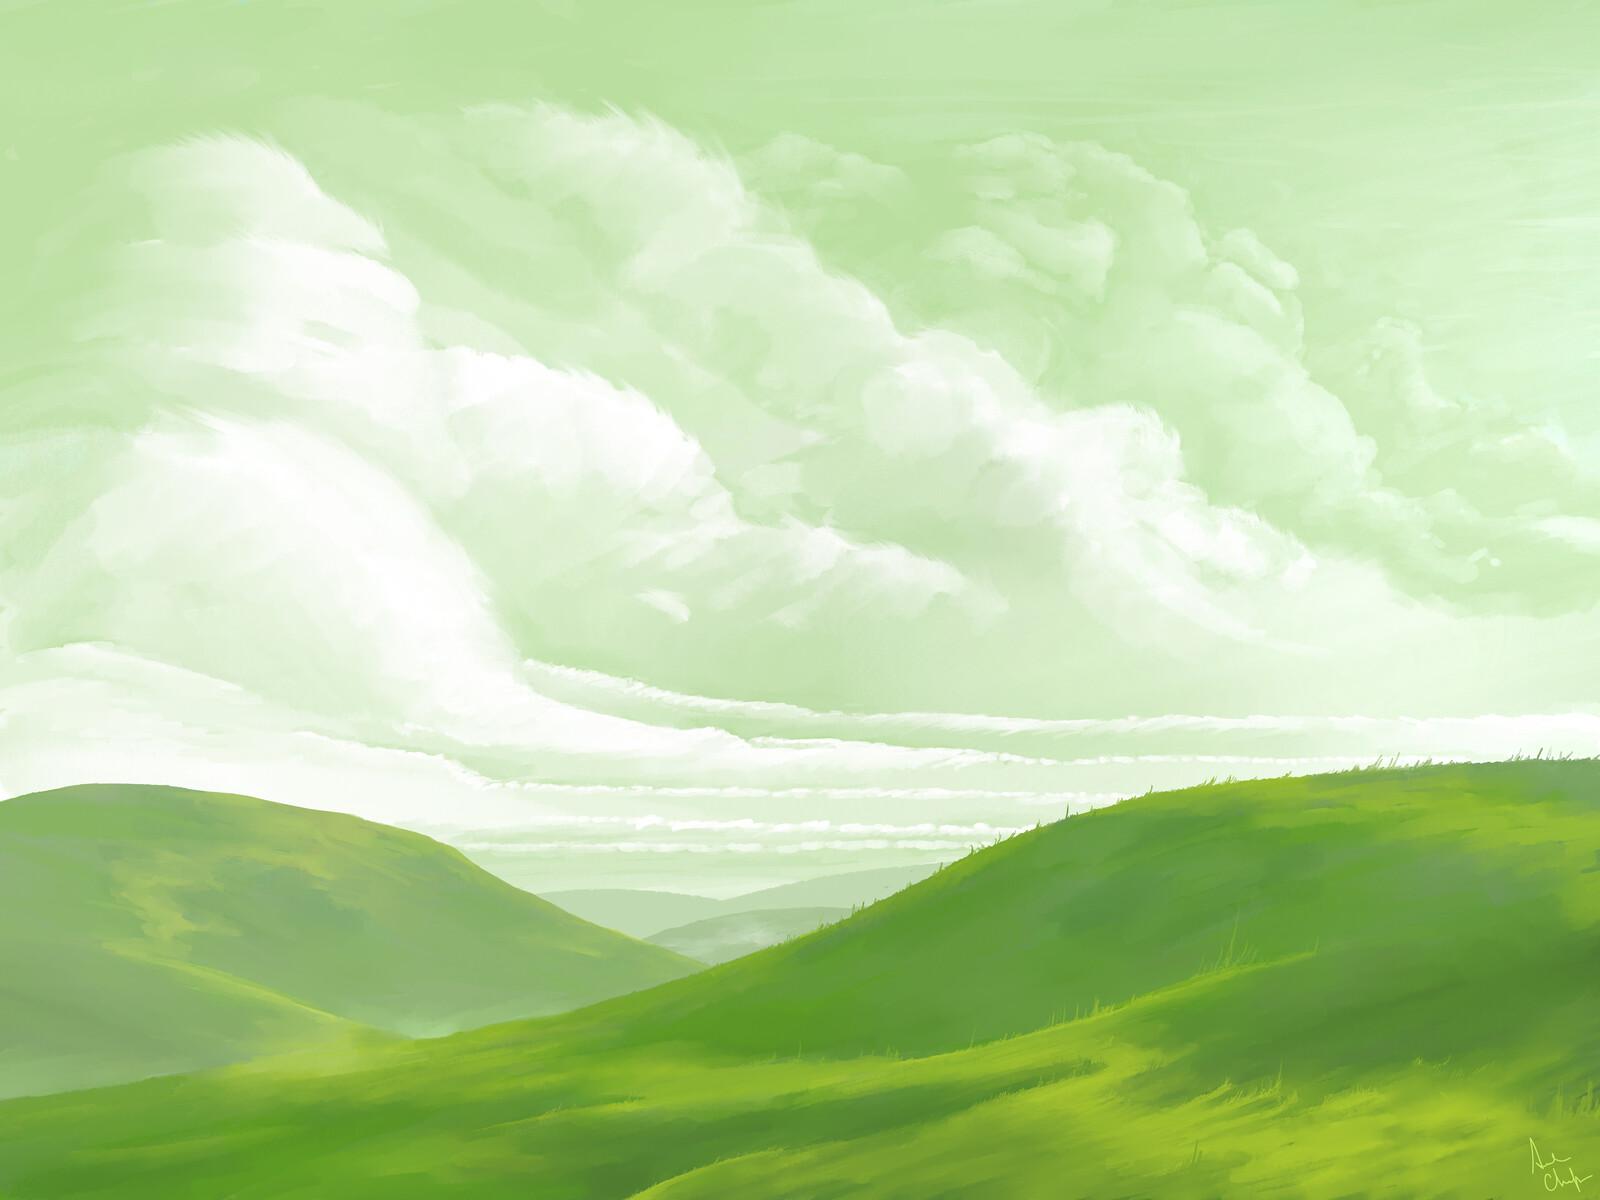 Avidity of the Hills